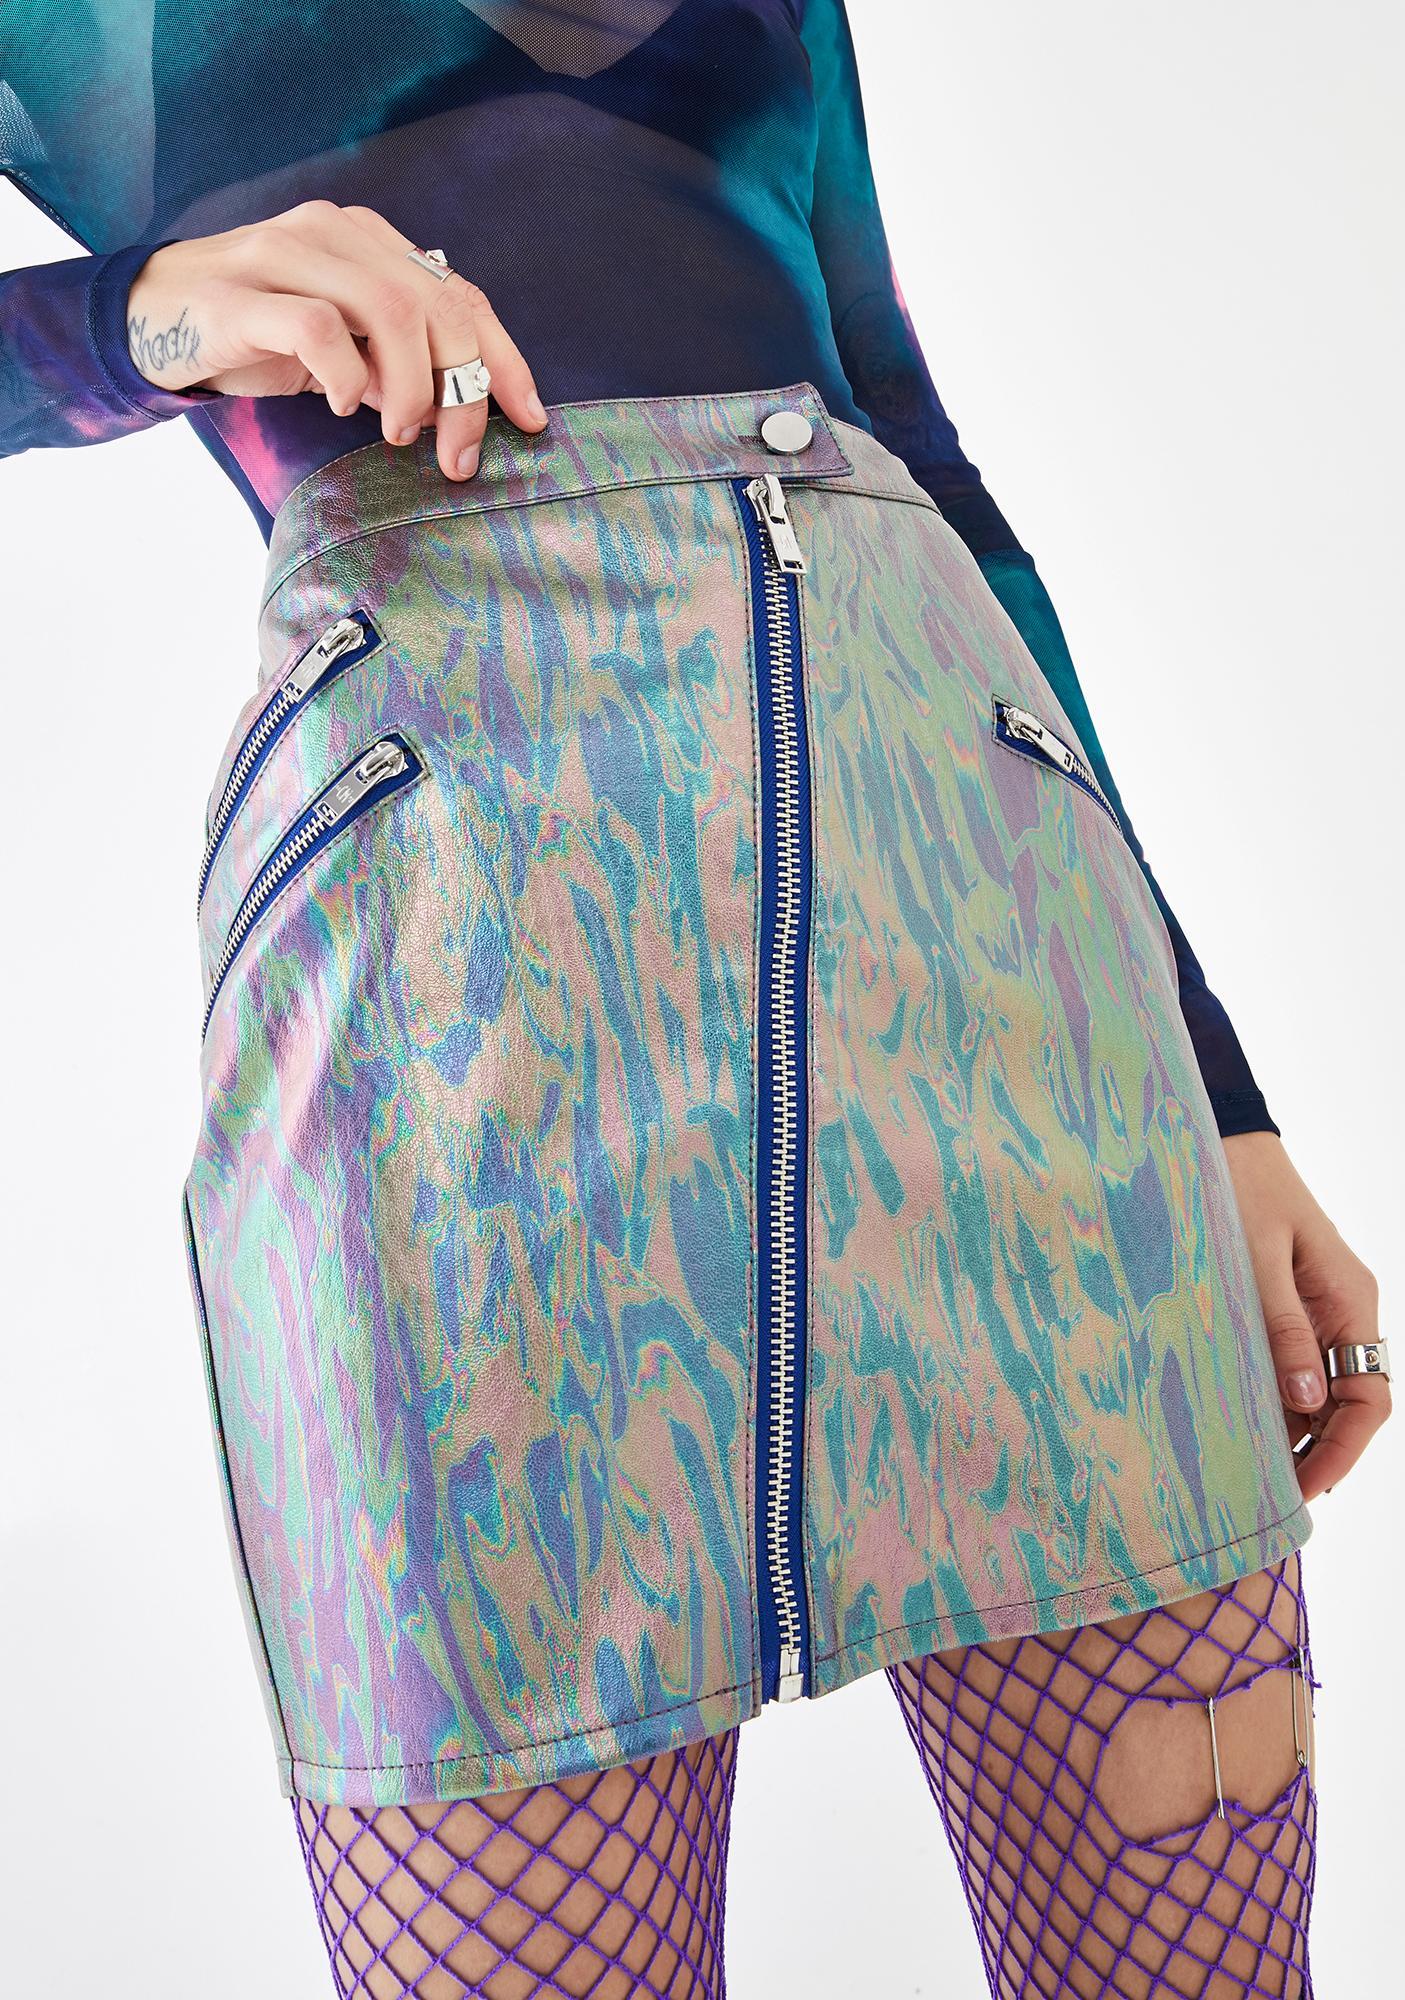 Current Mood Twisted Misfit Malfunction Zipper Skirt